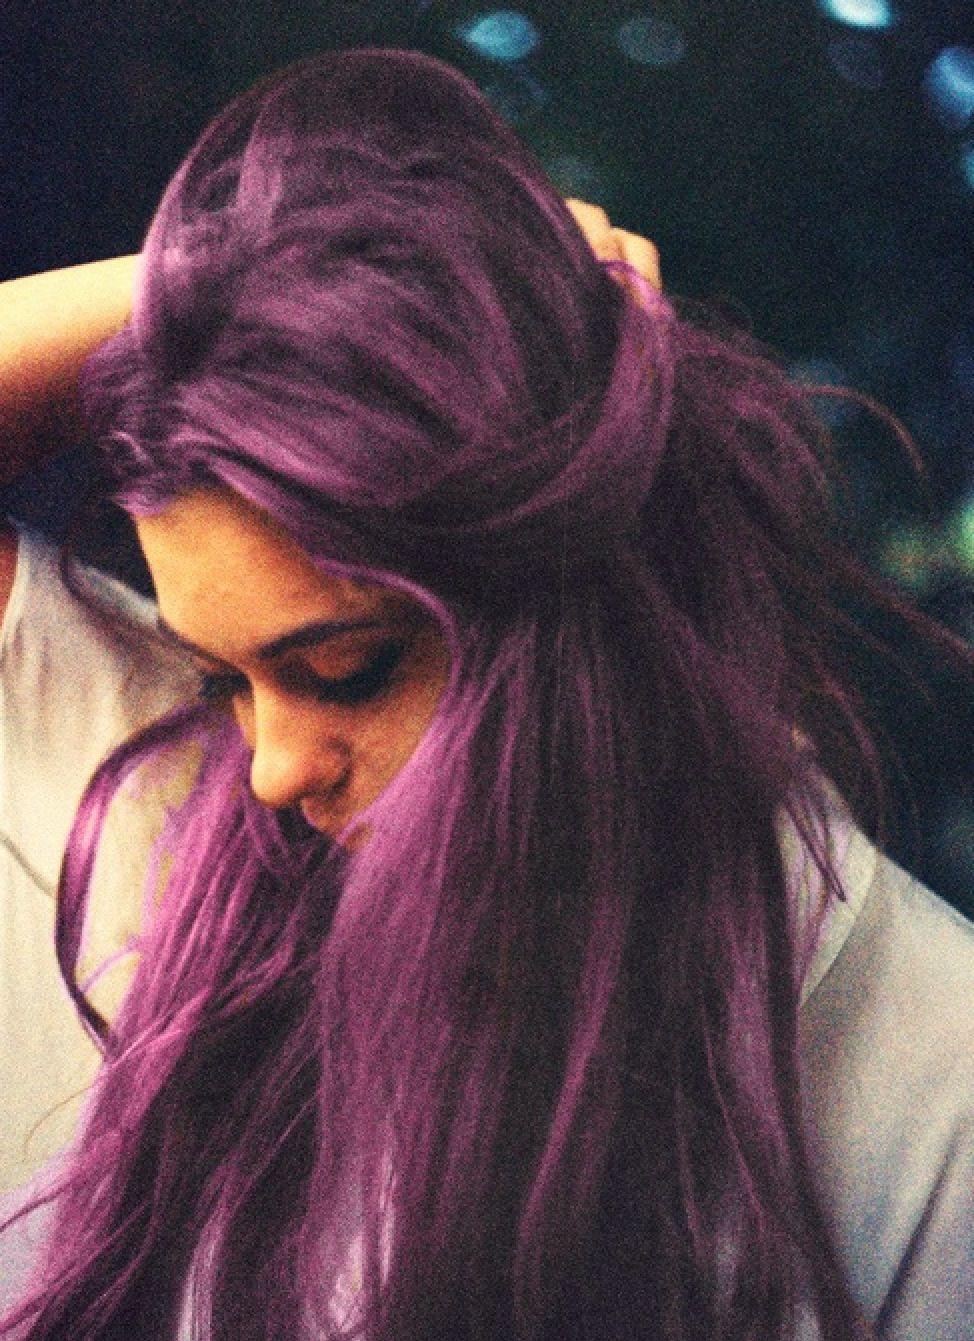 Pin by lightning on hair pinterest hair style dye hair and hair